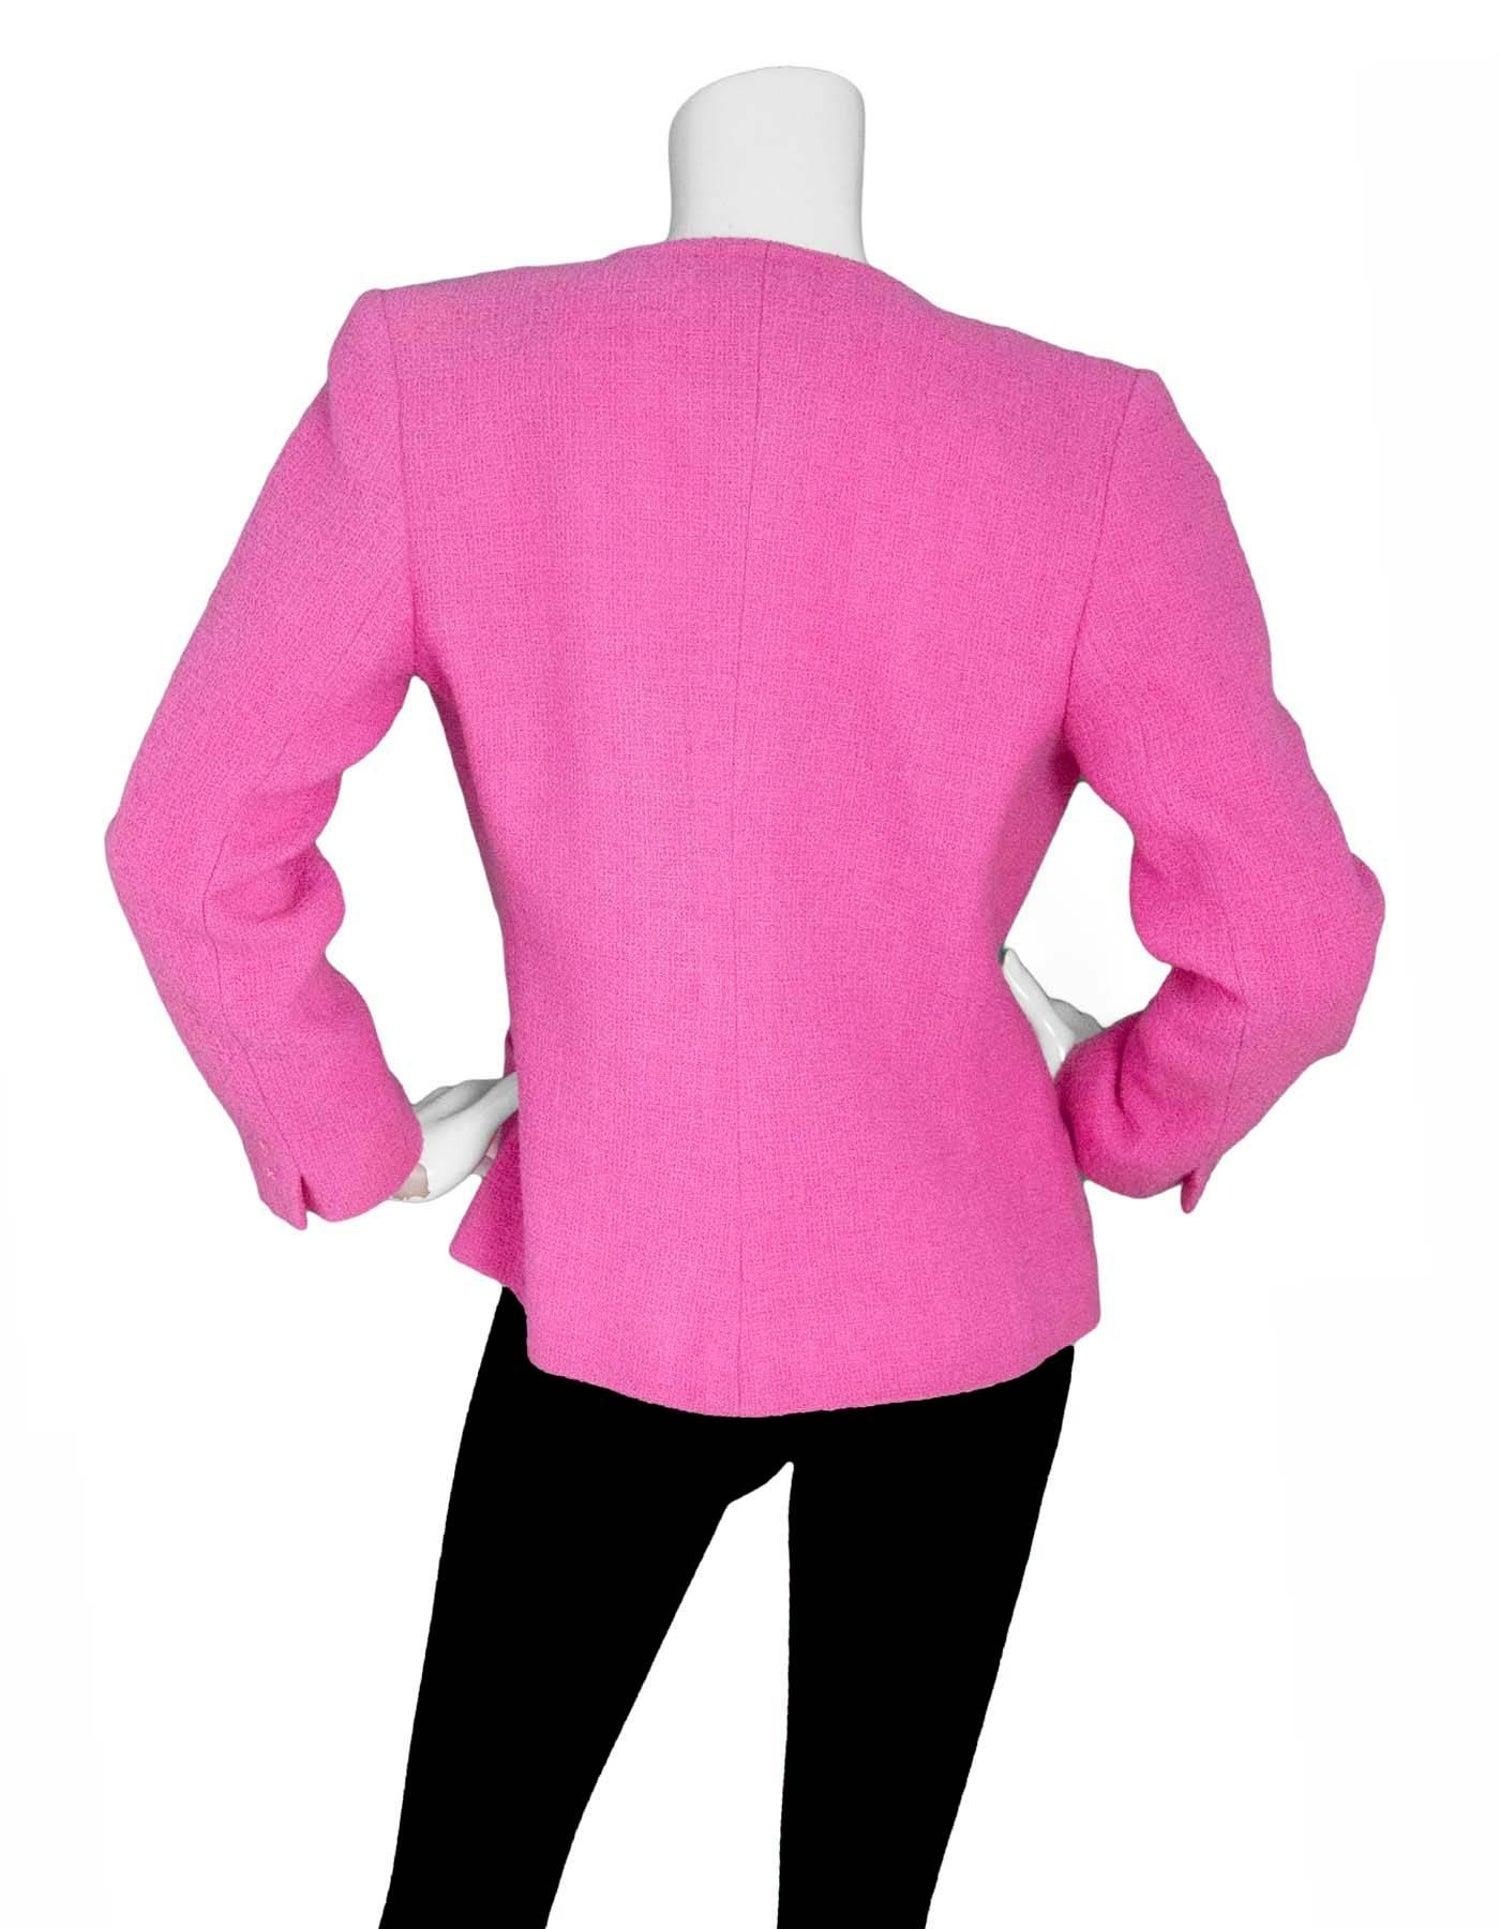 Yves Saint Laurent Vintage Pink Boucle Jackie-O Style Jacket Sz 6